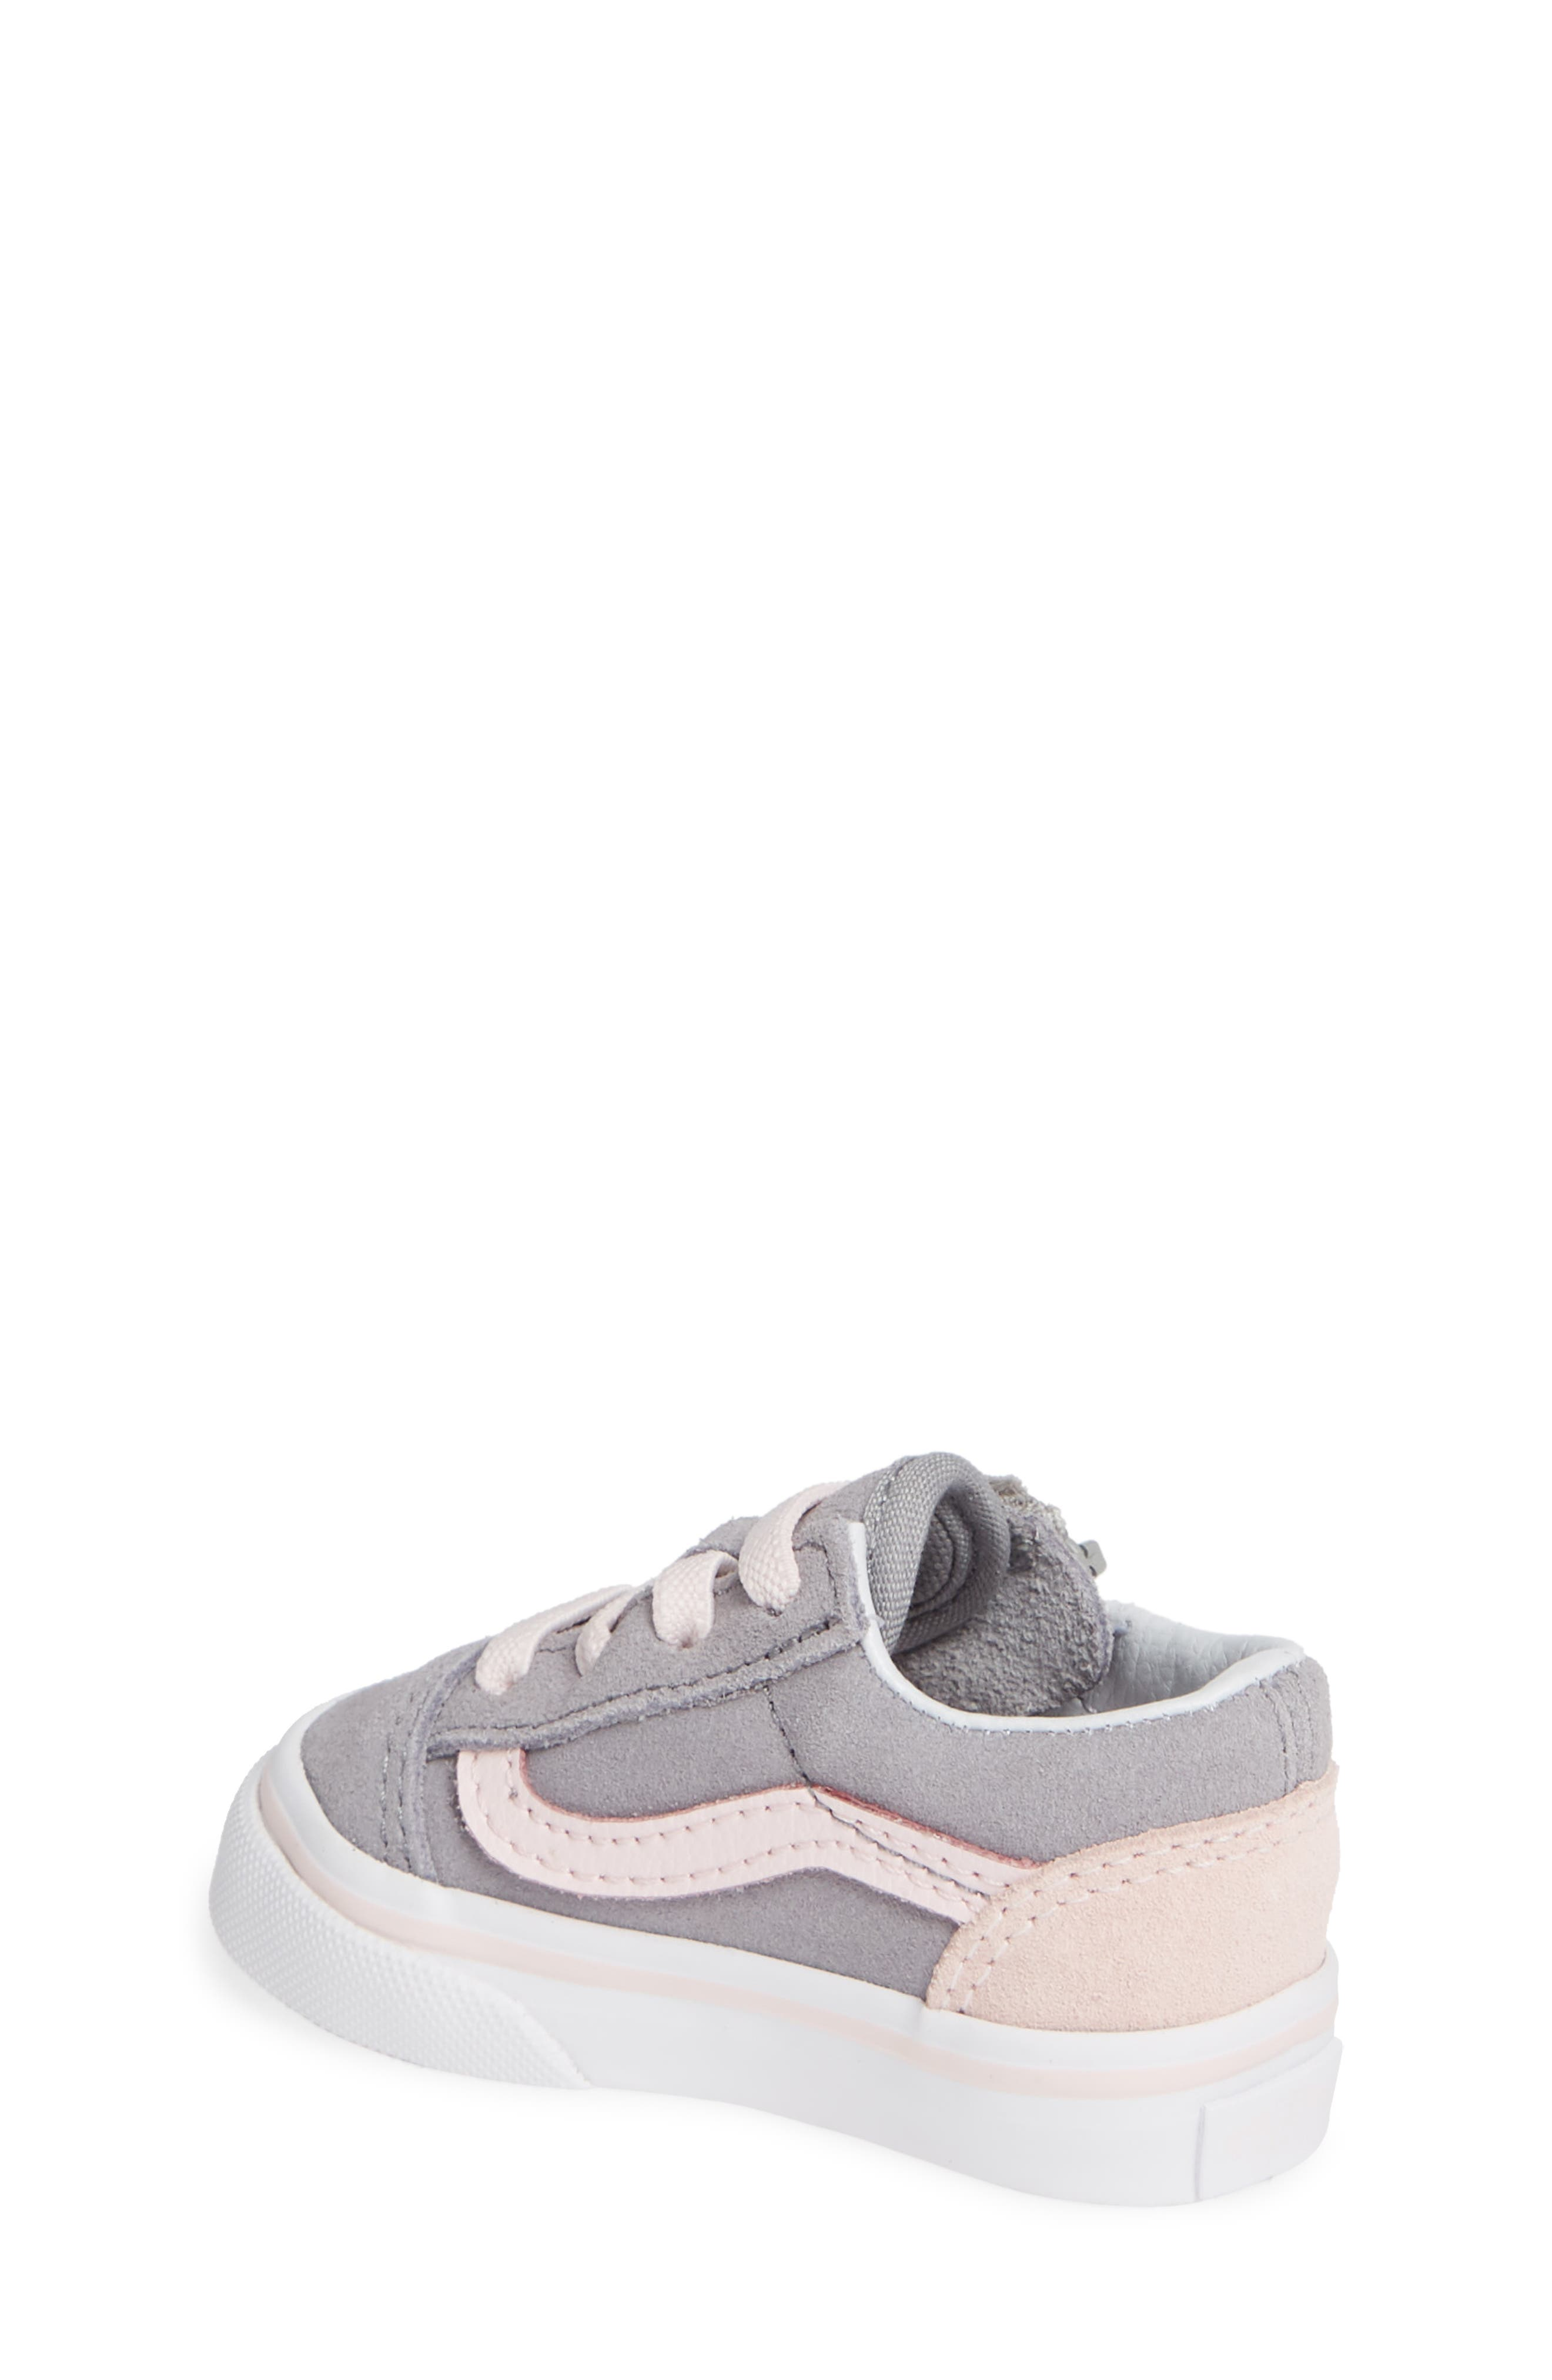 Old Skool Zip Sneaker,                             Alternate thumbnail 2, color,                             SUEDE ALLOY/ PINK/ TRUE WHITE